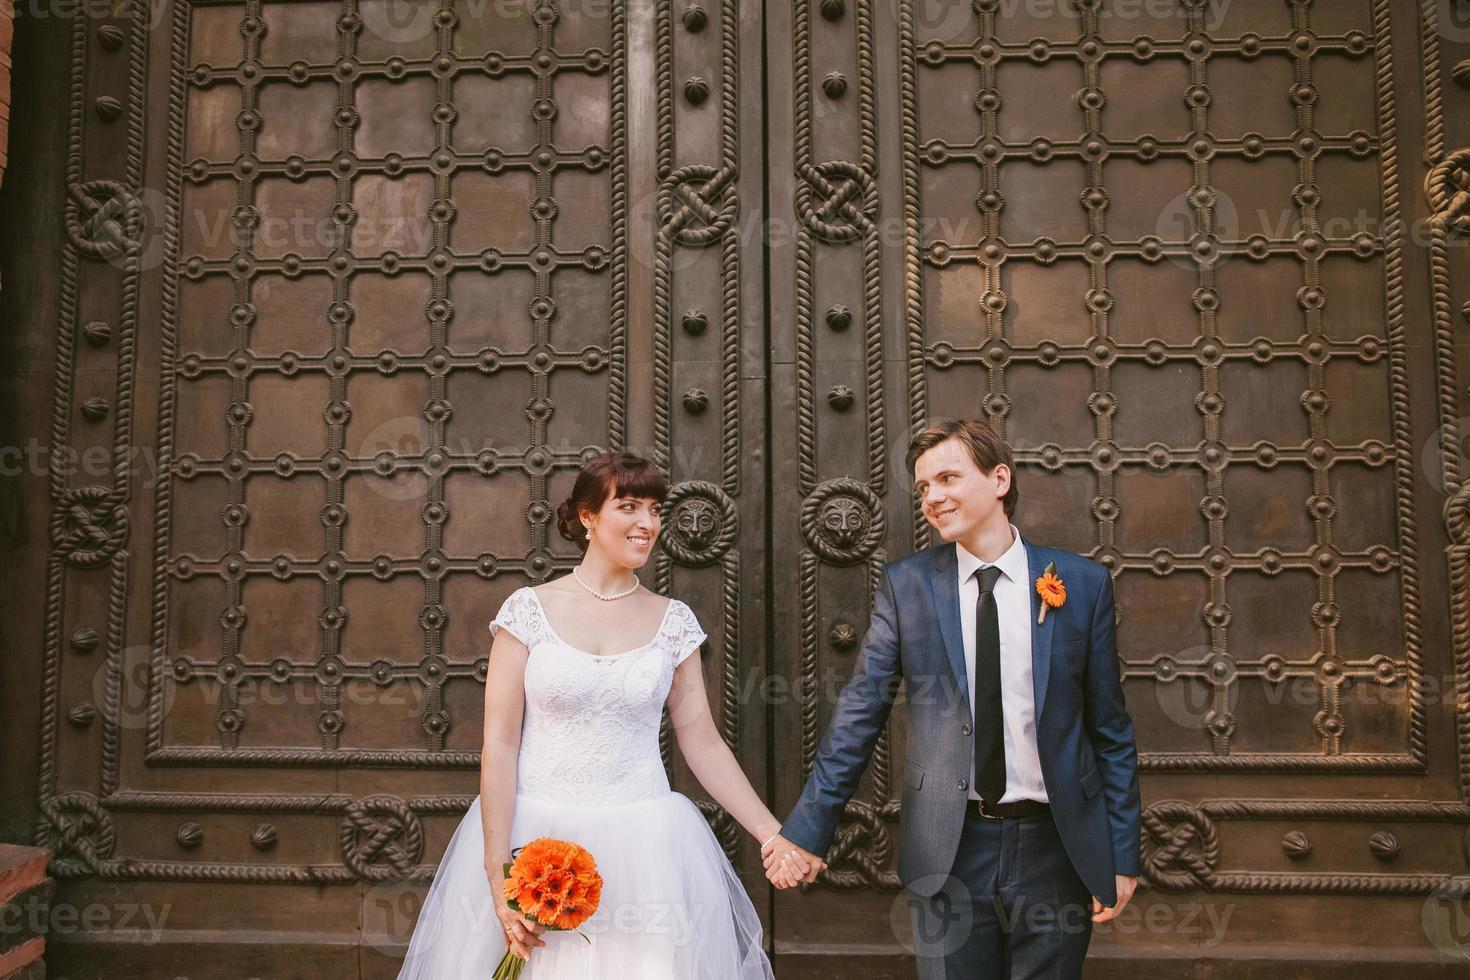 Wedding couple holding hands photo